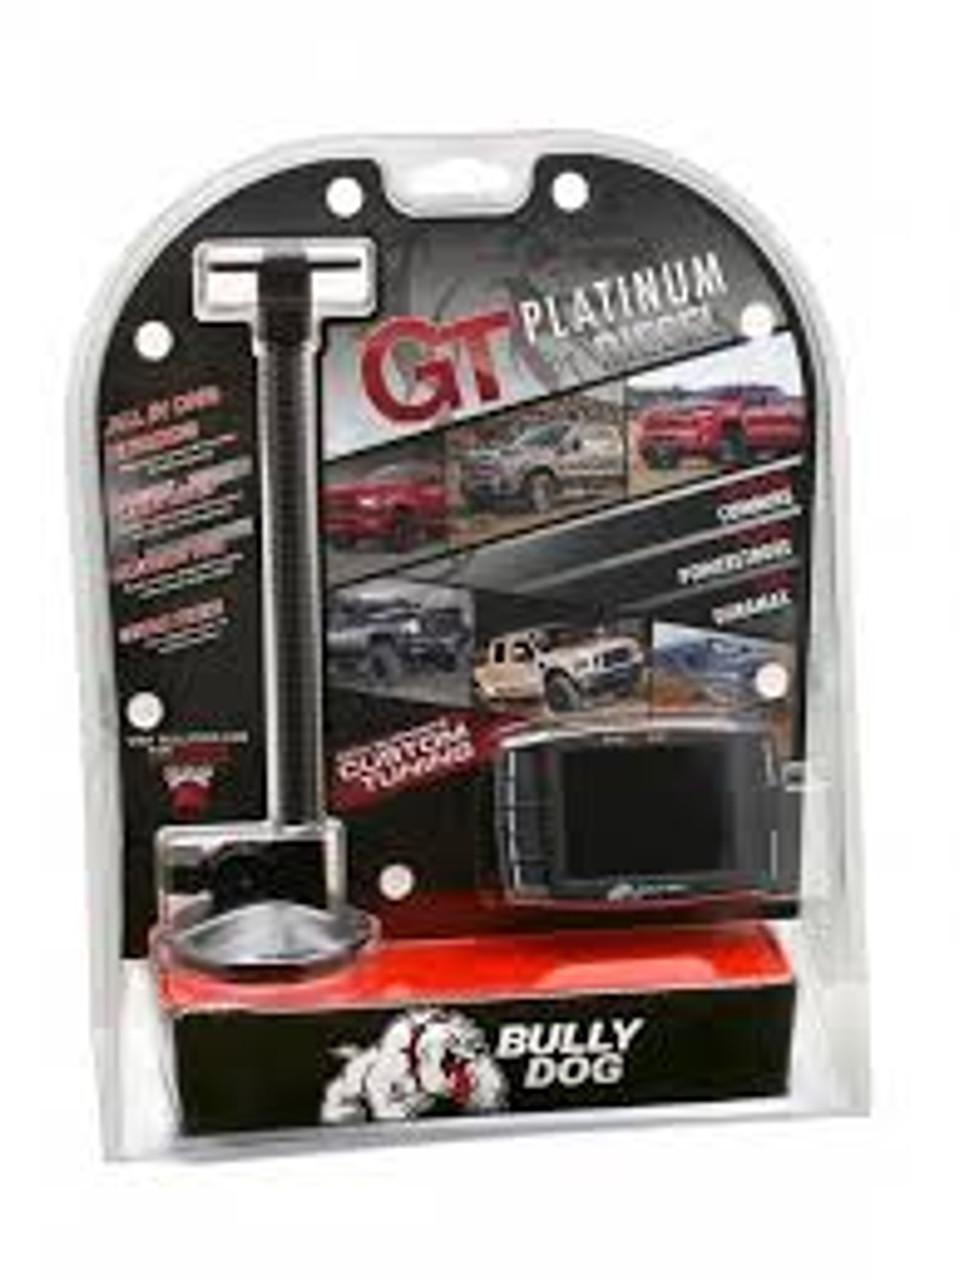 Bully Dog 40420 >> Bully Dog 40420 Gt Platinum Diesel Tuner